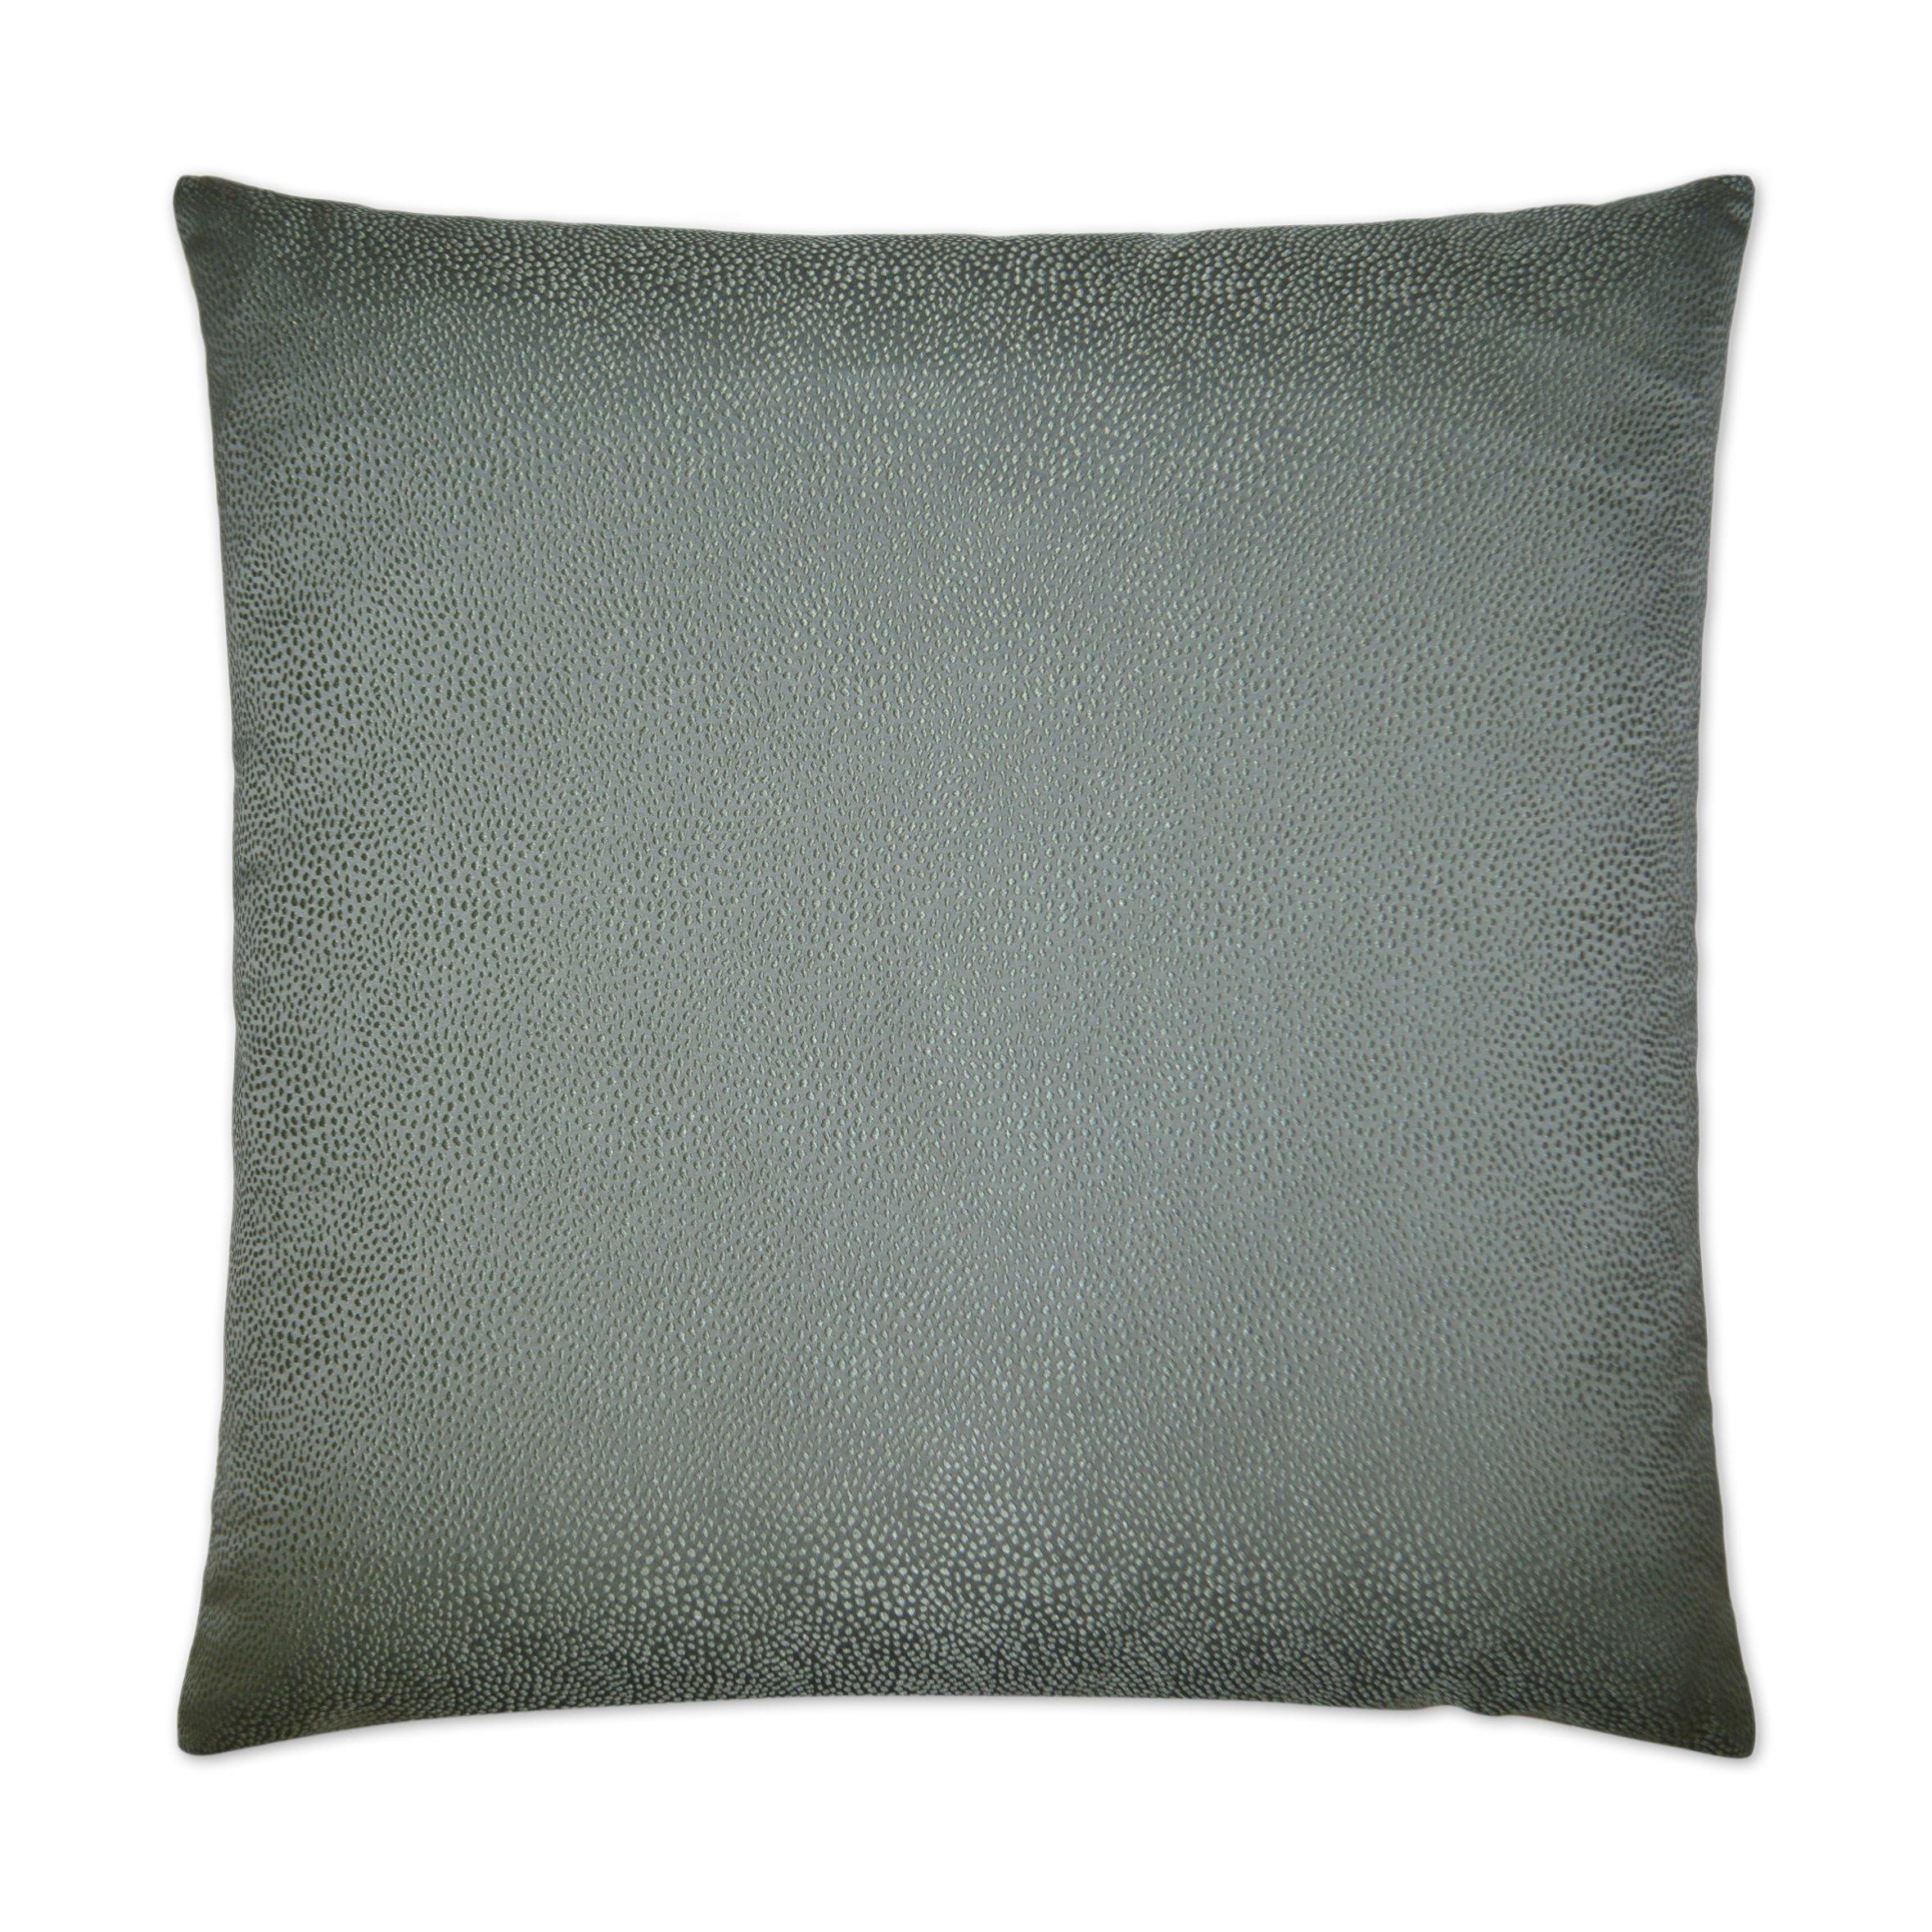 Canaan Company Decorative Pillow Van Ness Studio 2537-S Siren-Spa